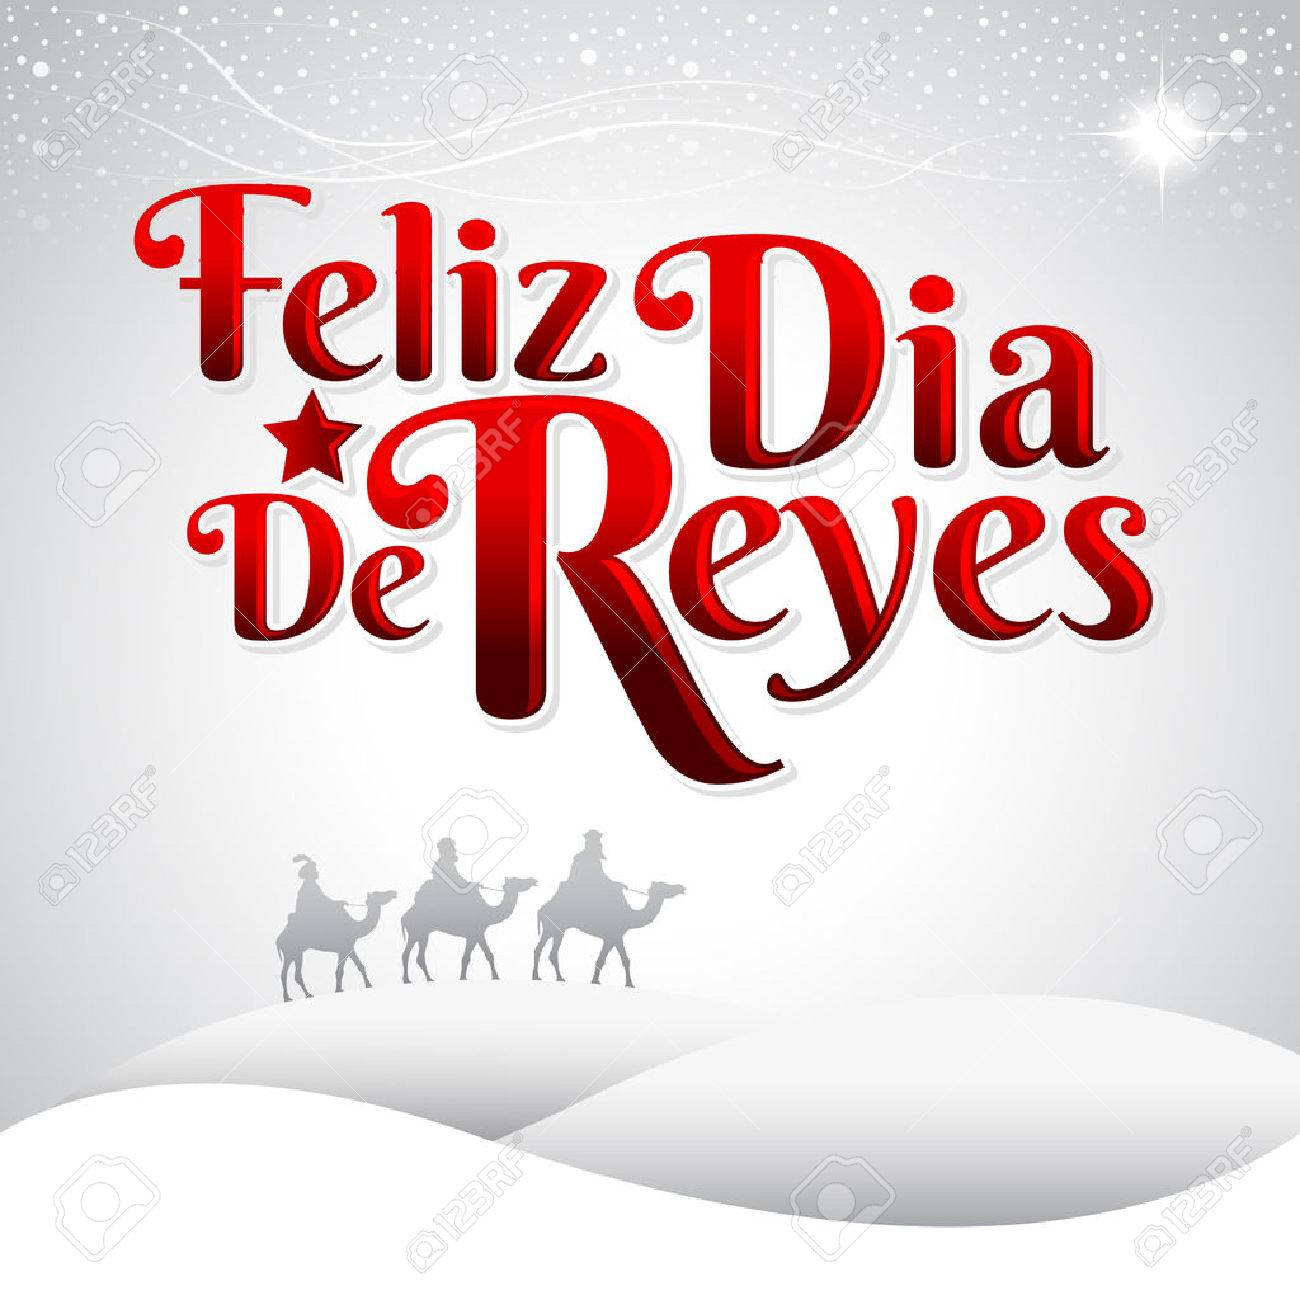 Feliz Dia De Reyes Fotos.Feliz Dia De Reyes Happy Day Of Kings Spanish Text Is A Latin